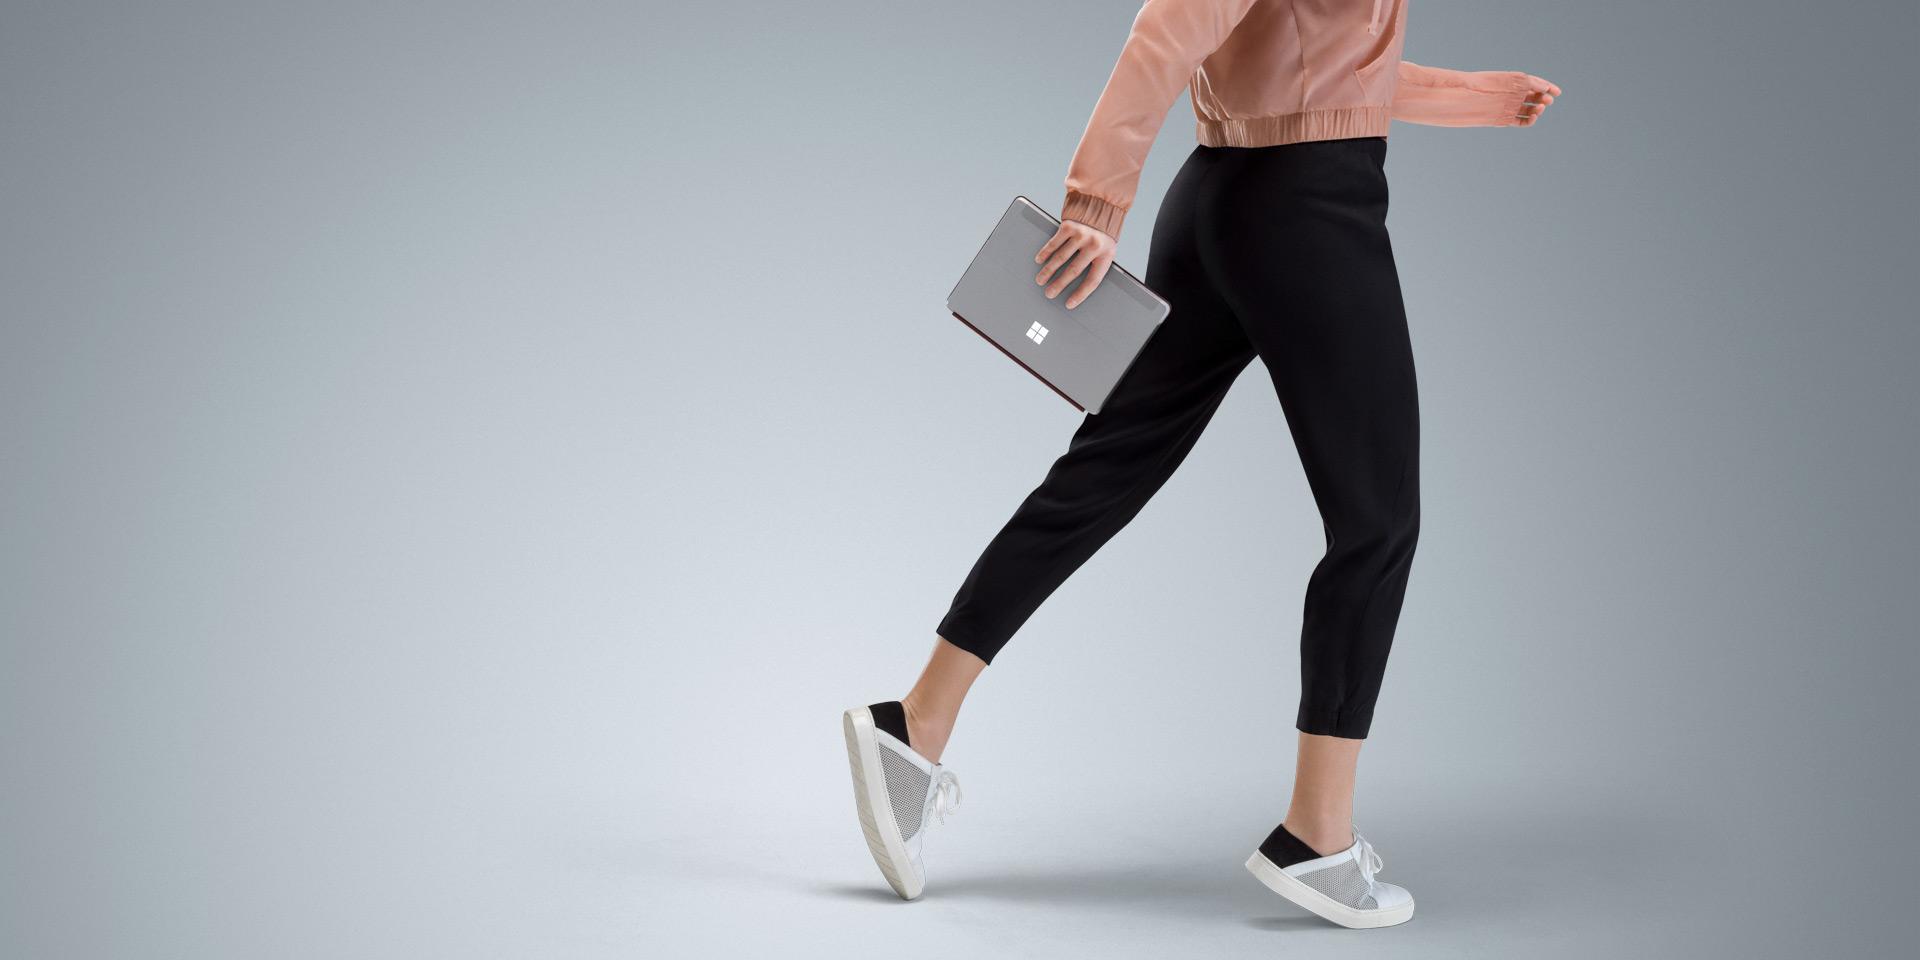 Surface Go ในมือของผู้หญิงคนหนึ่งขณะกำลังเดิน